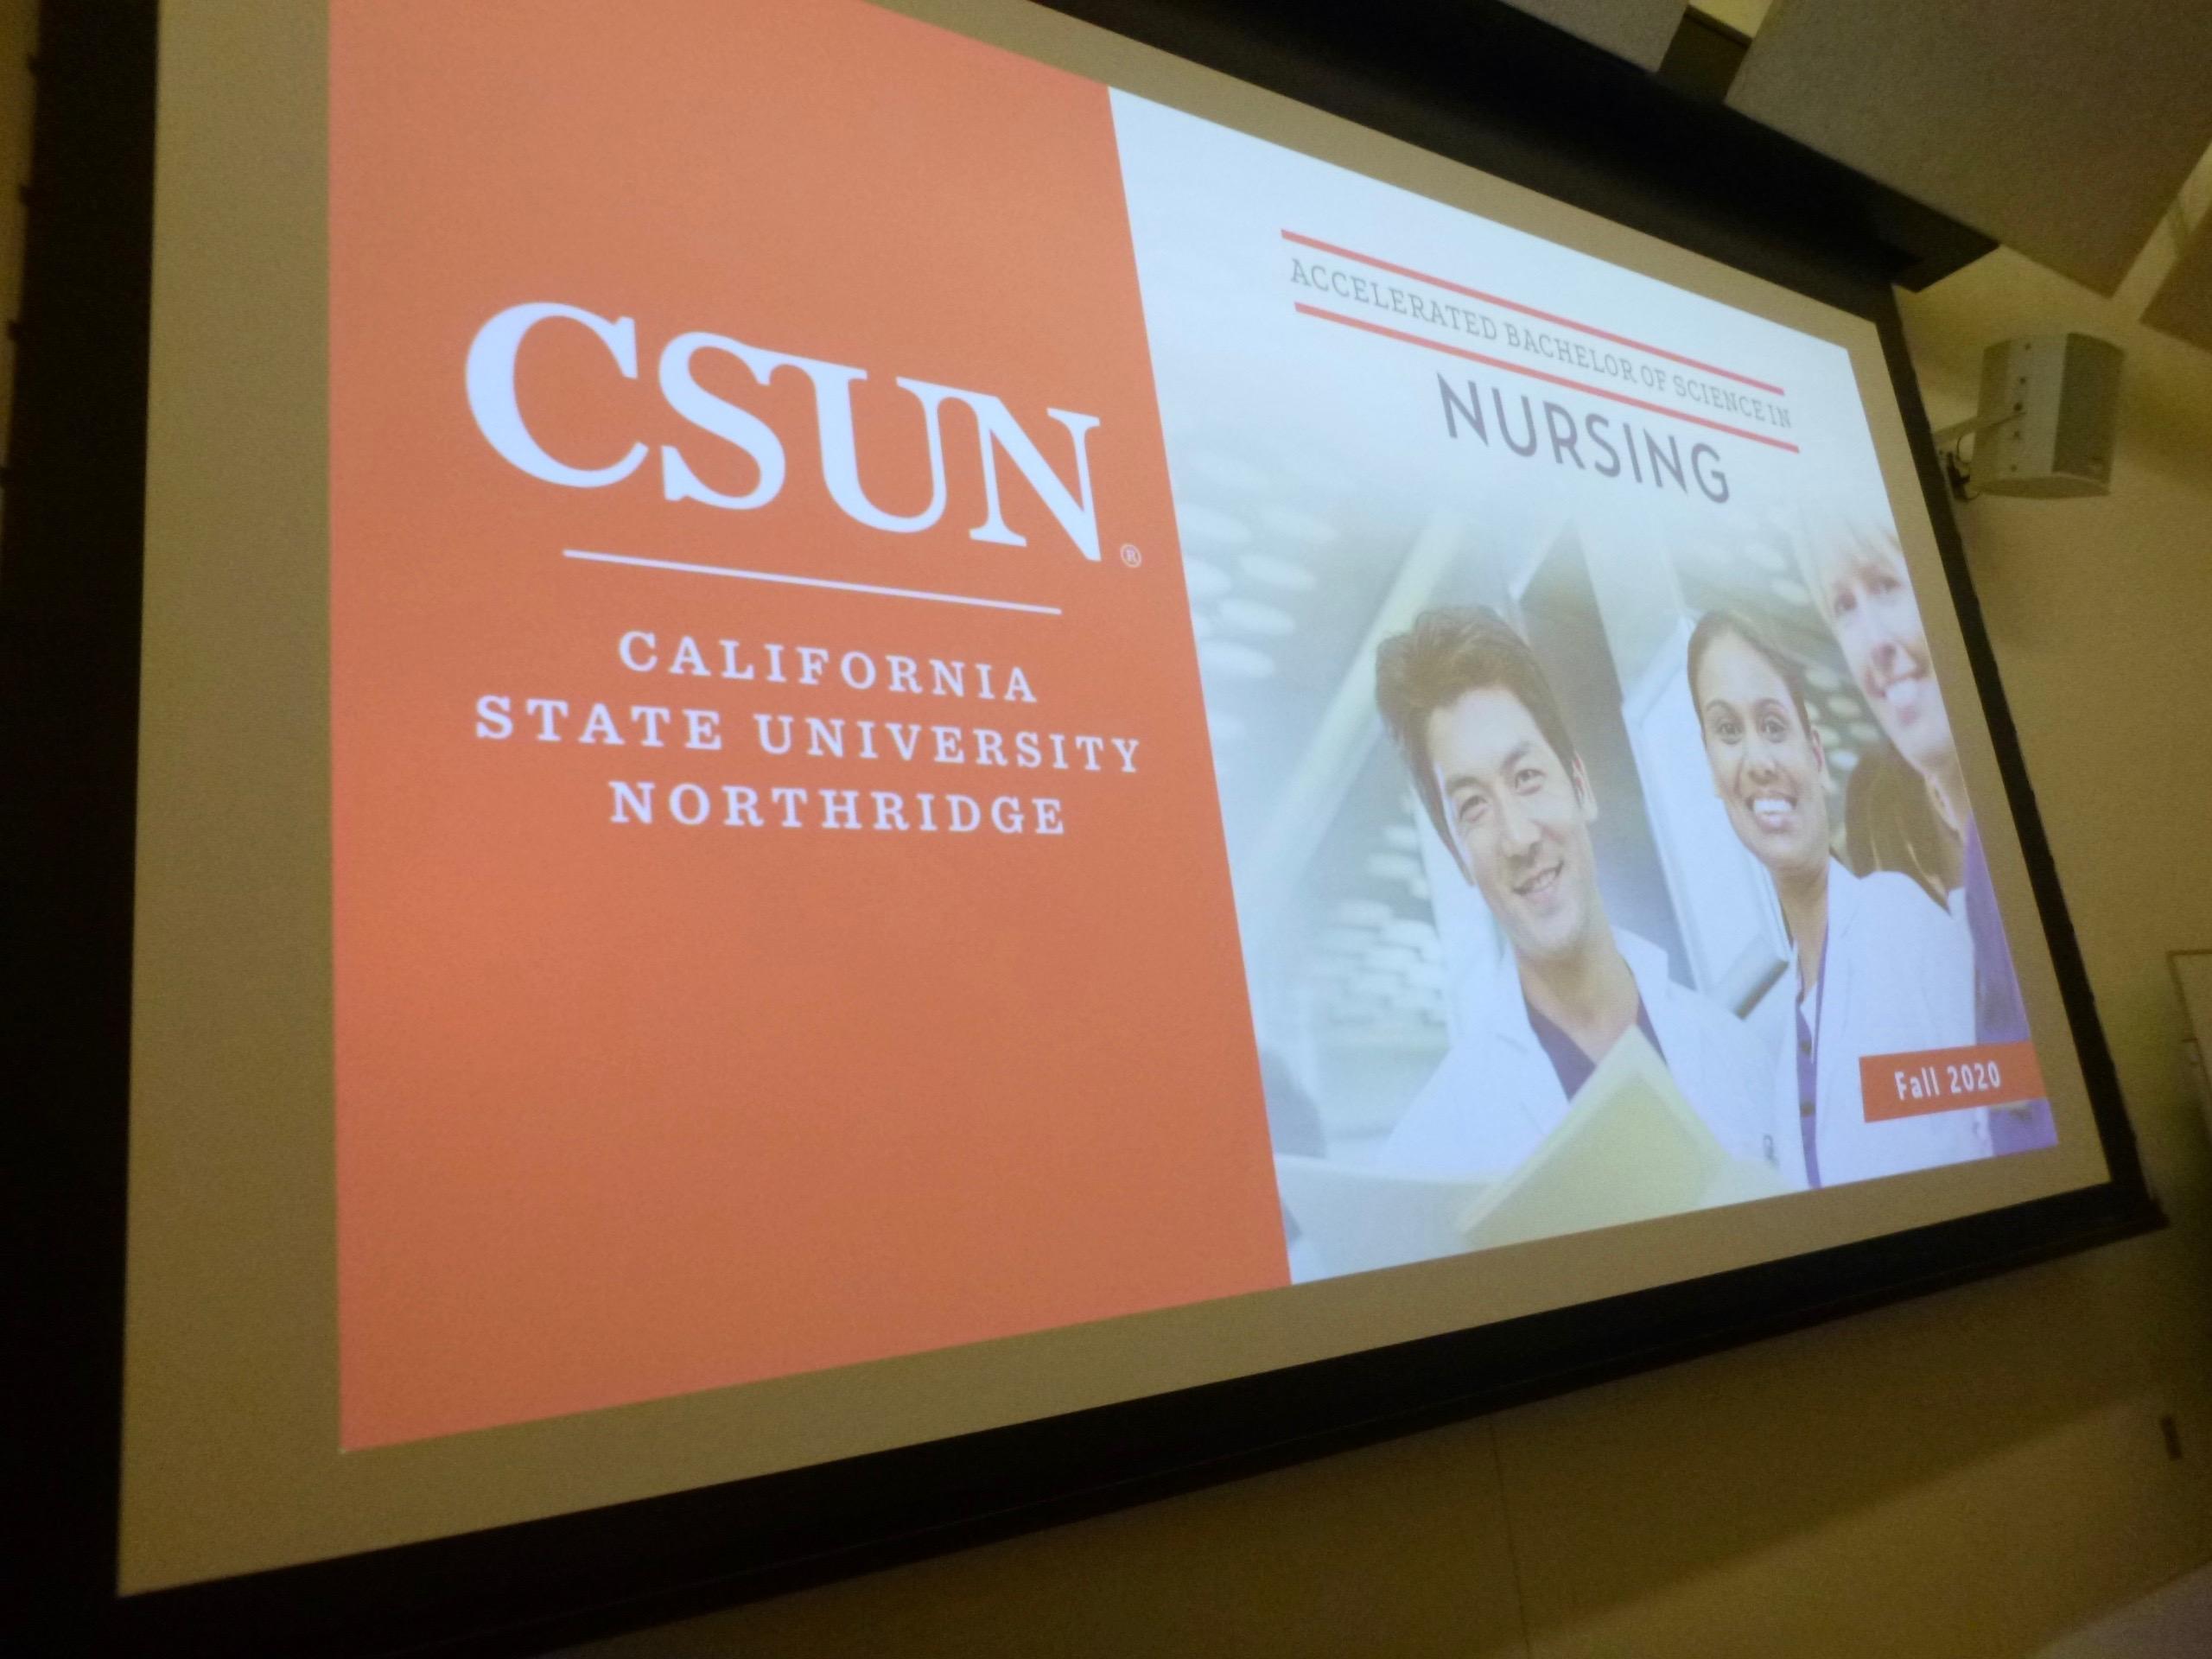 Accelerated Bachelor of Science Nursing Program PowerPoint slide